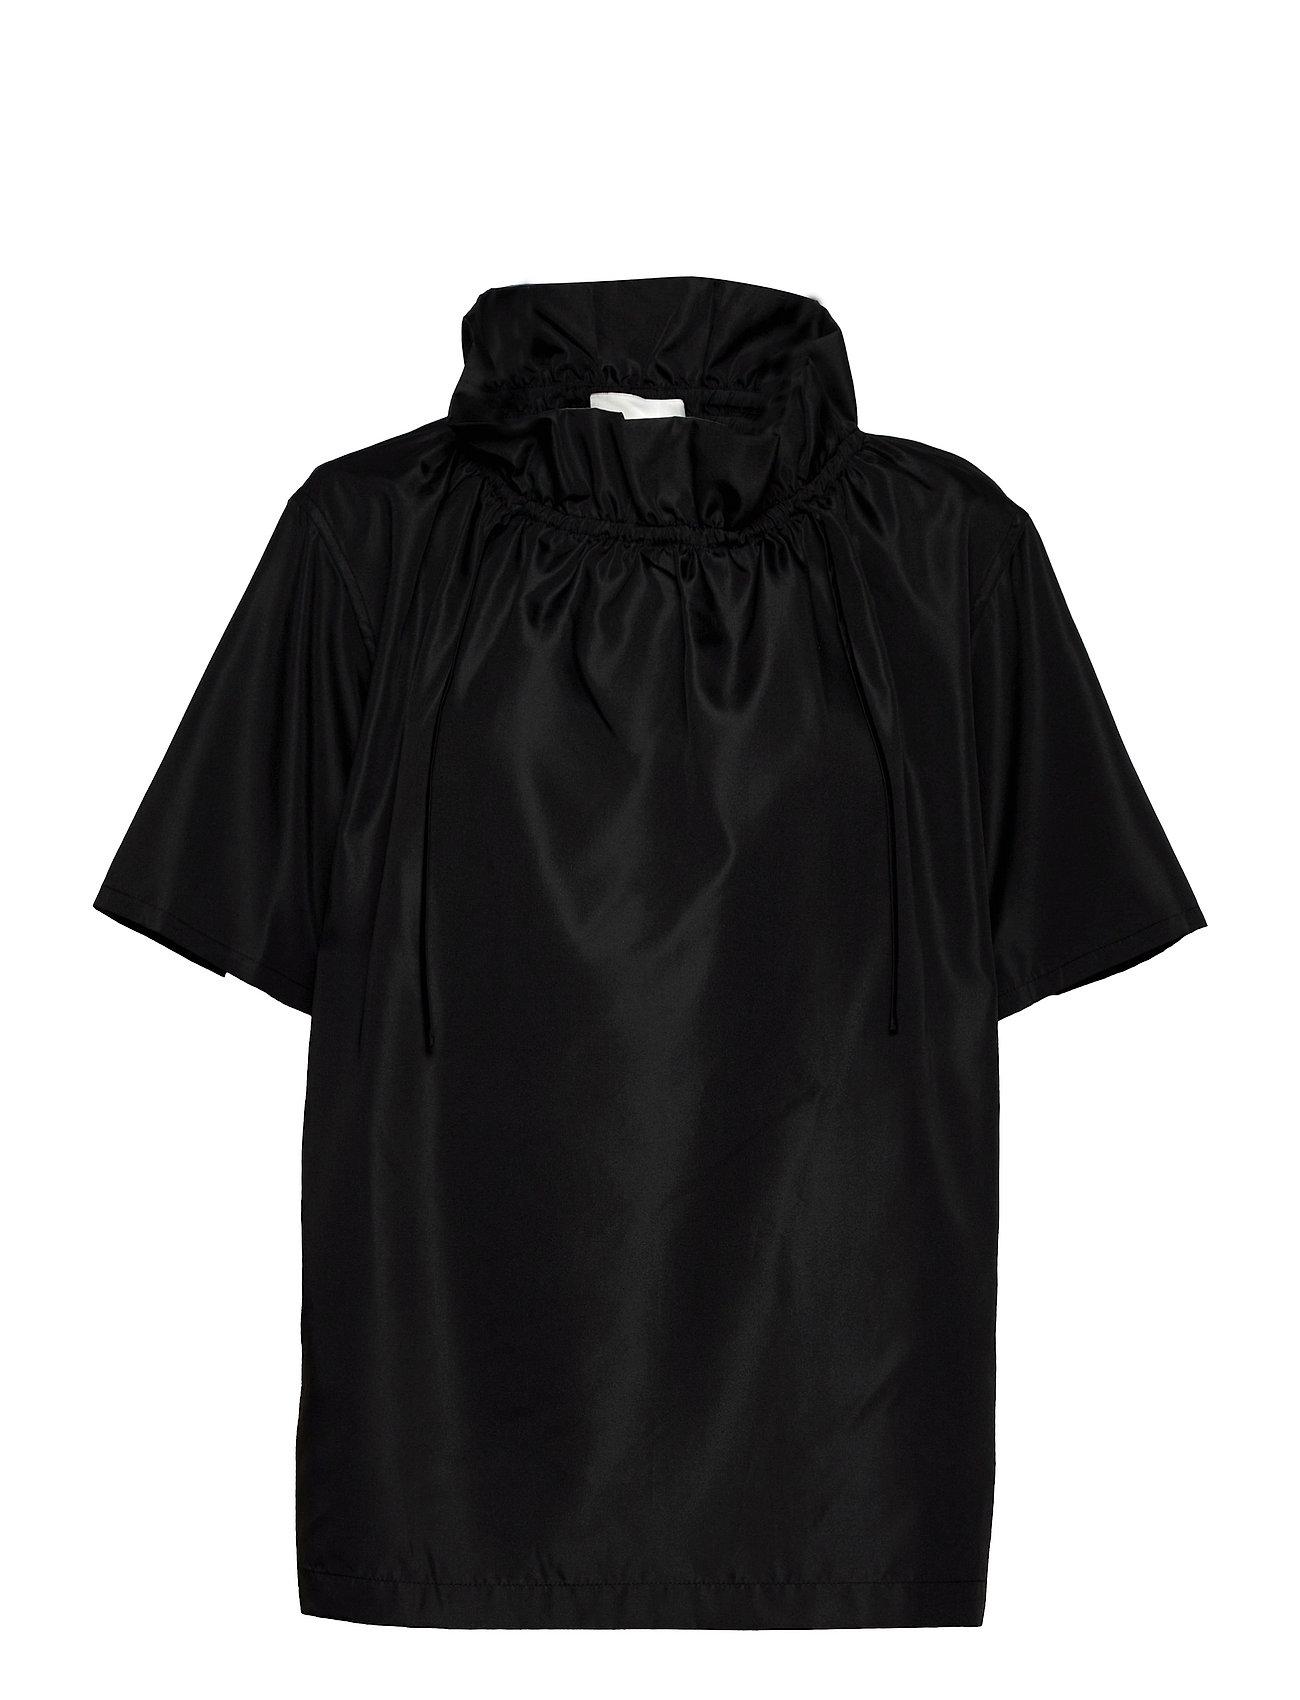 P212-2882prt / Ss Ruched Neck Boxing Taffeta Top Blouses Short-sleeved Sort 3.1 Phillip Lim